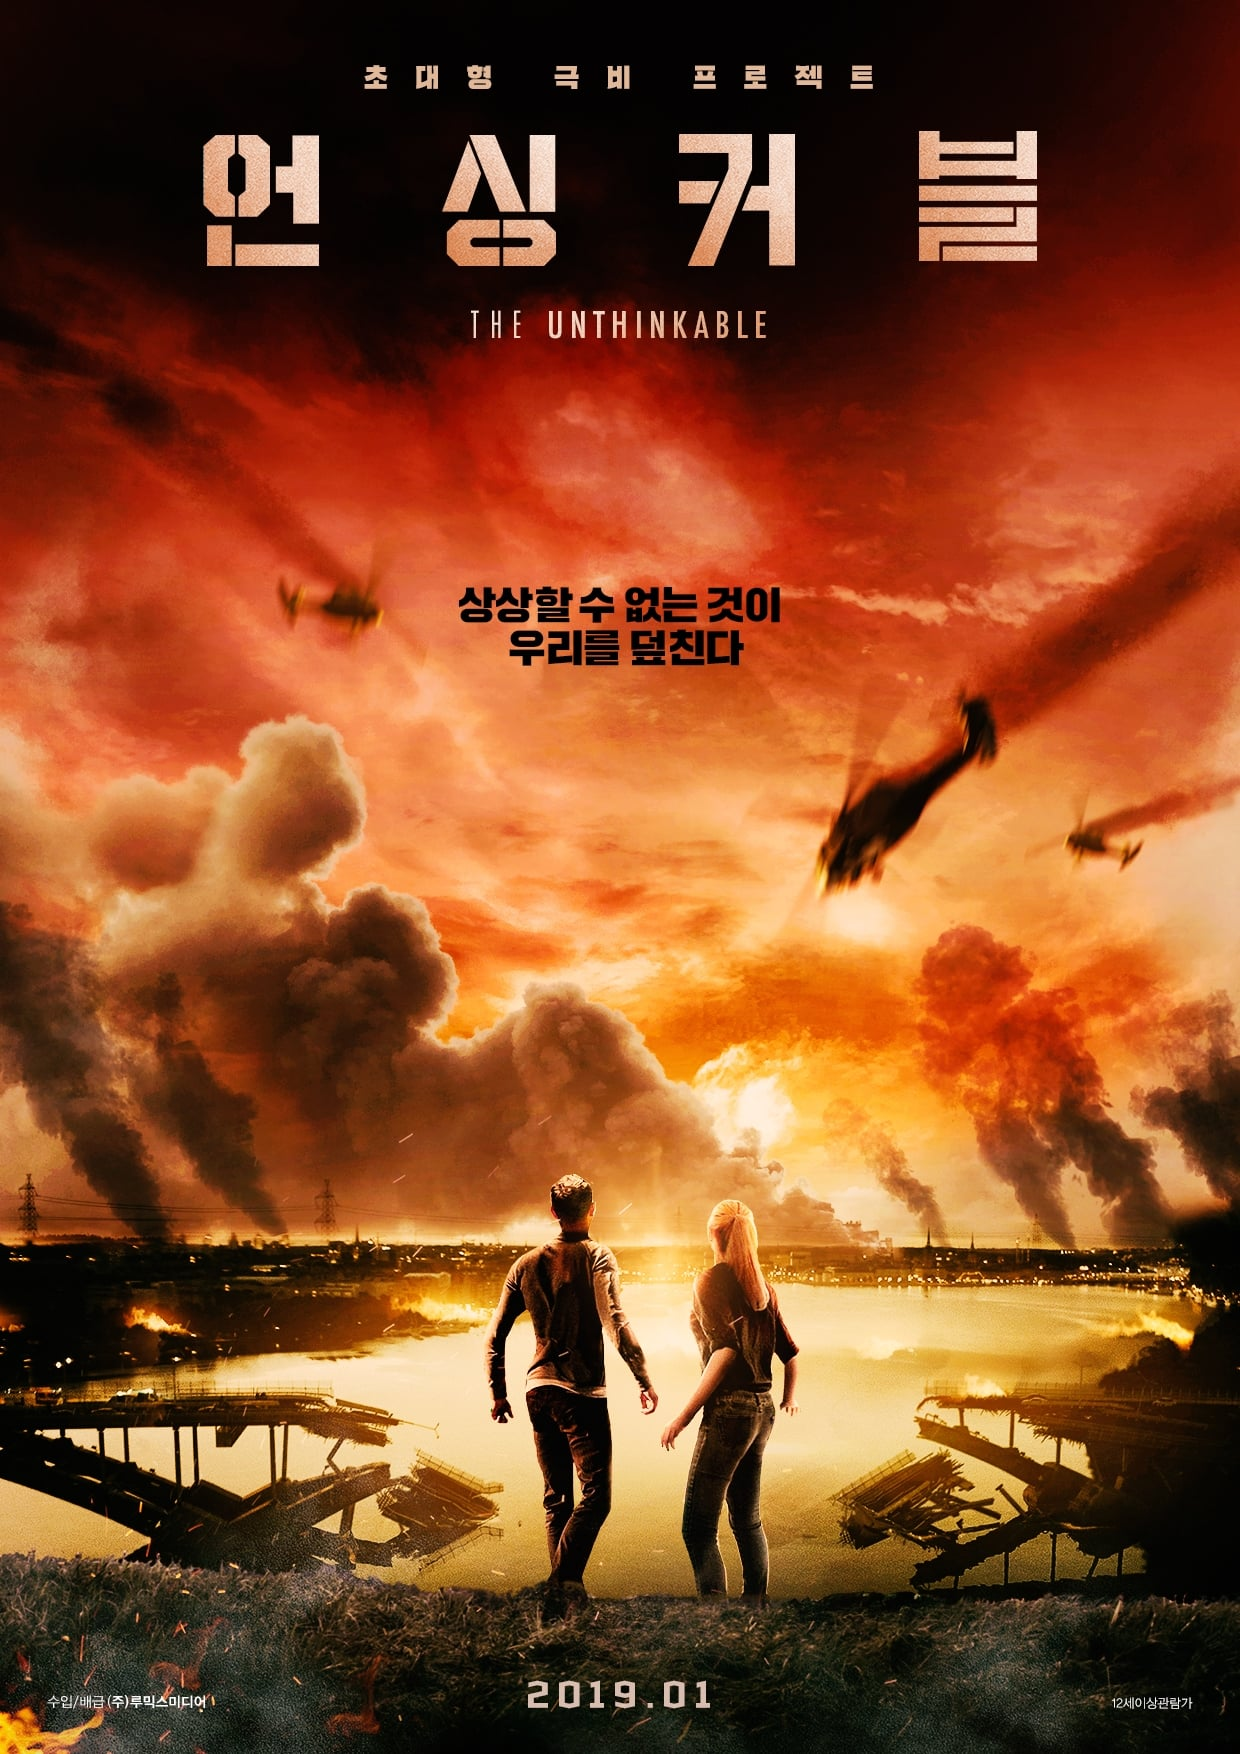 Pelicula The Unthinkable (2018) HD 720P ESPAÑOL/SUECO Online imagen